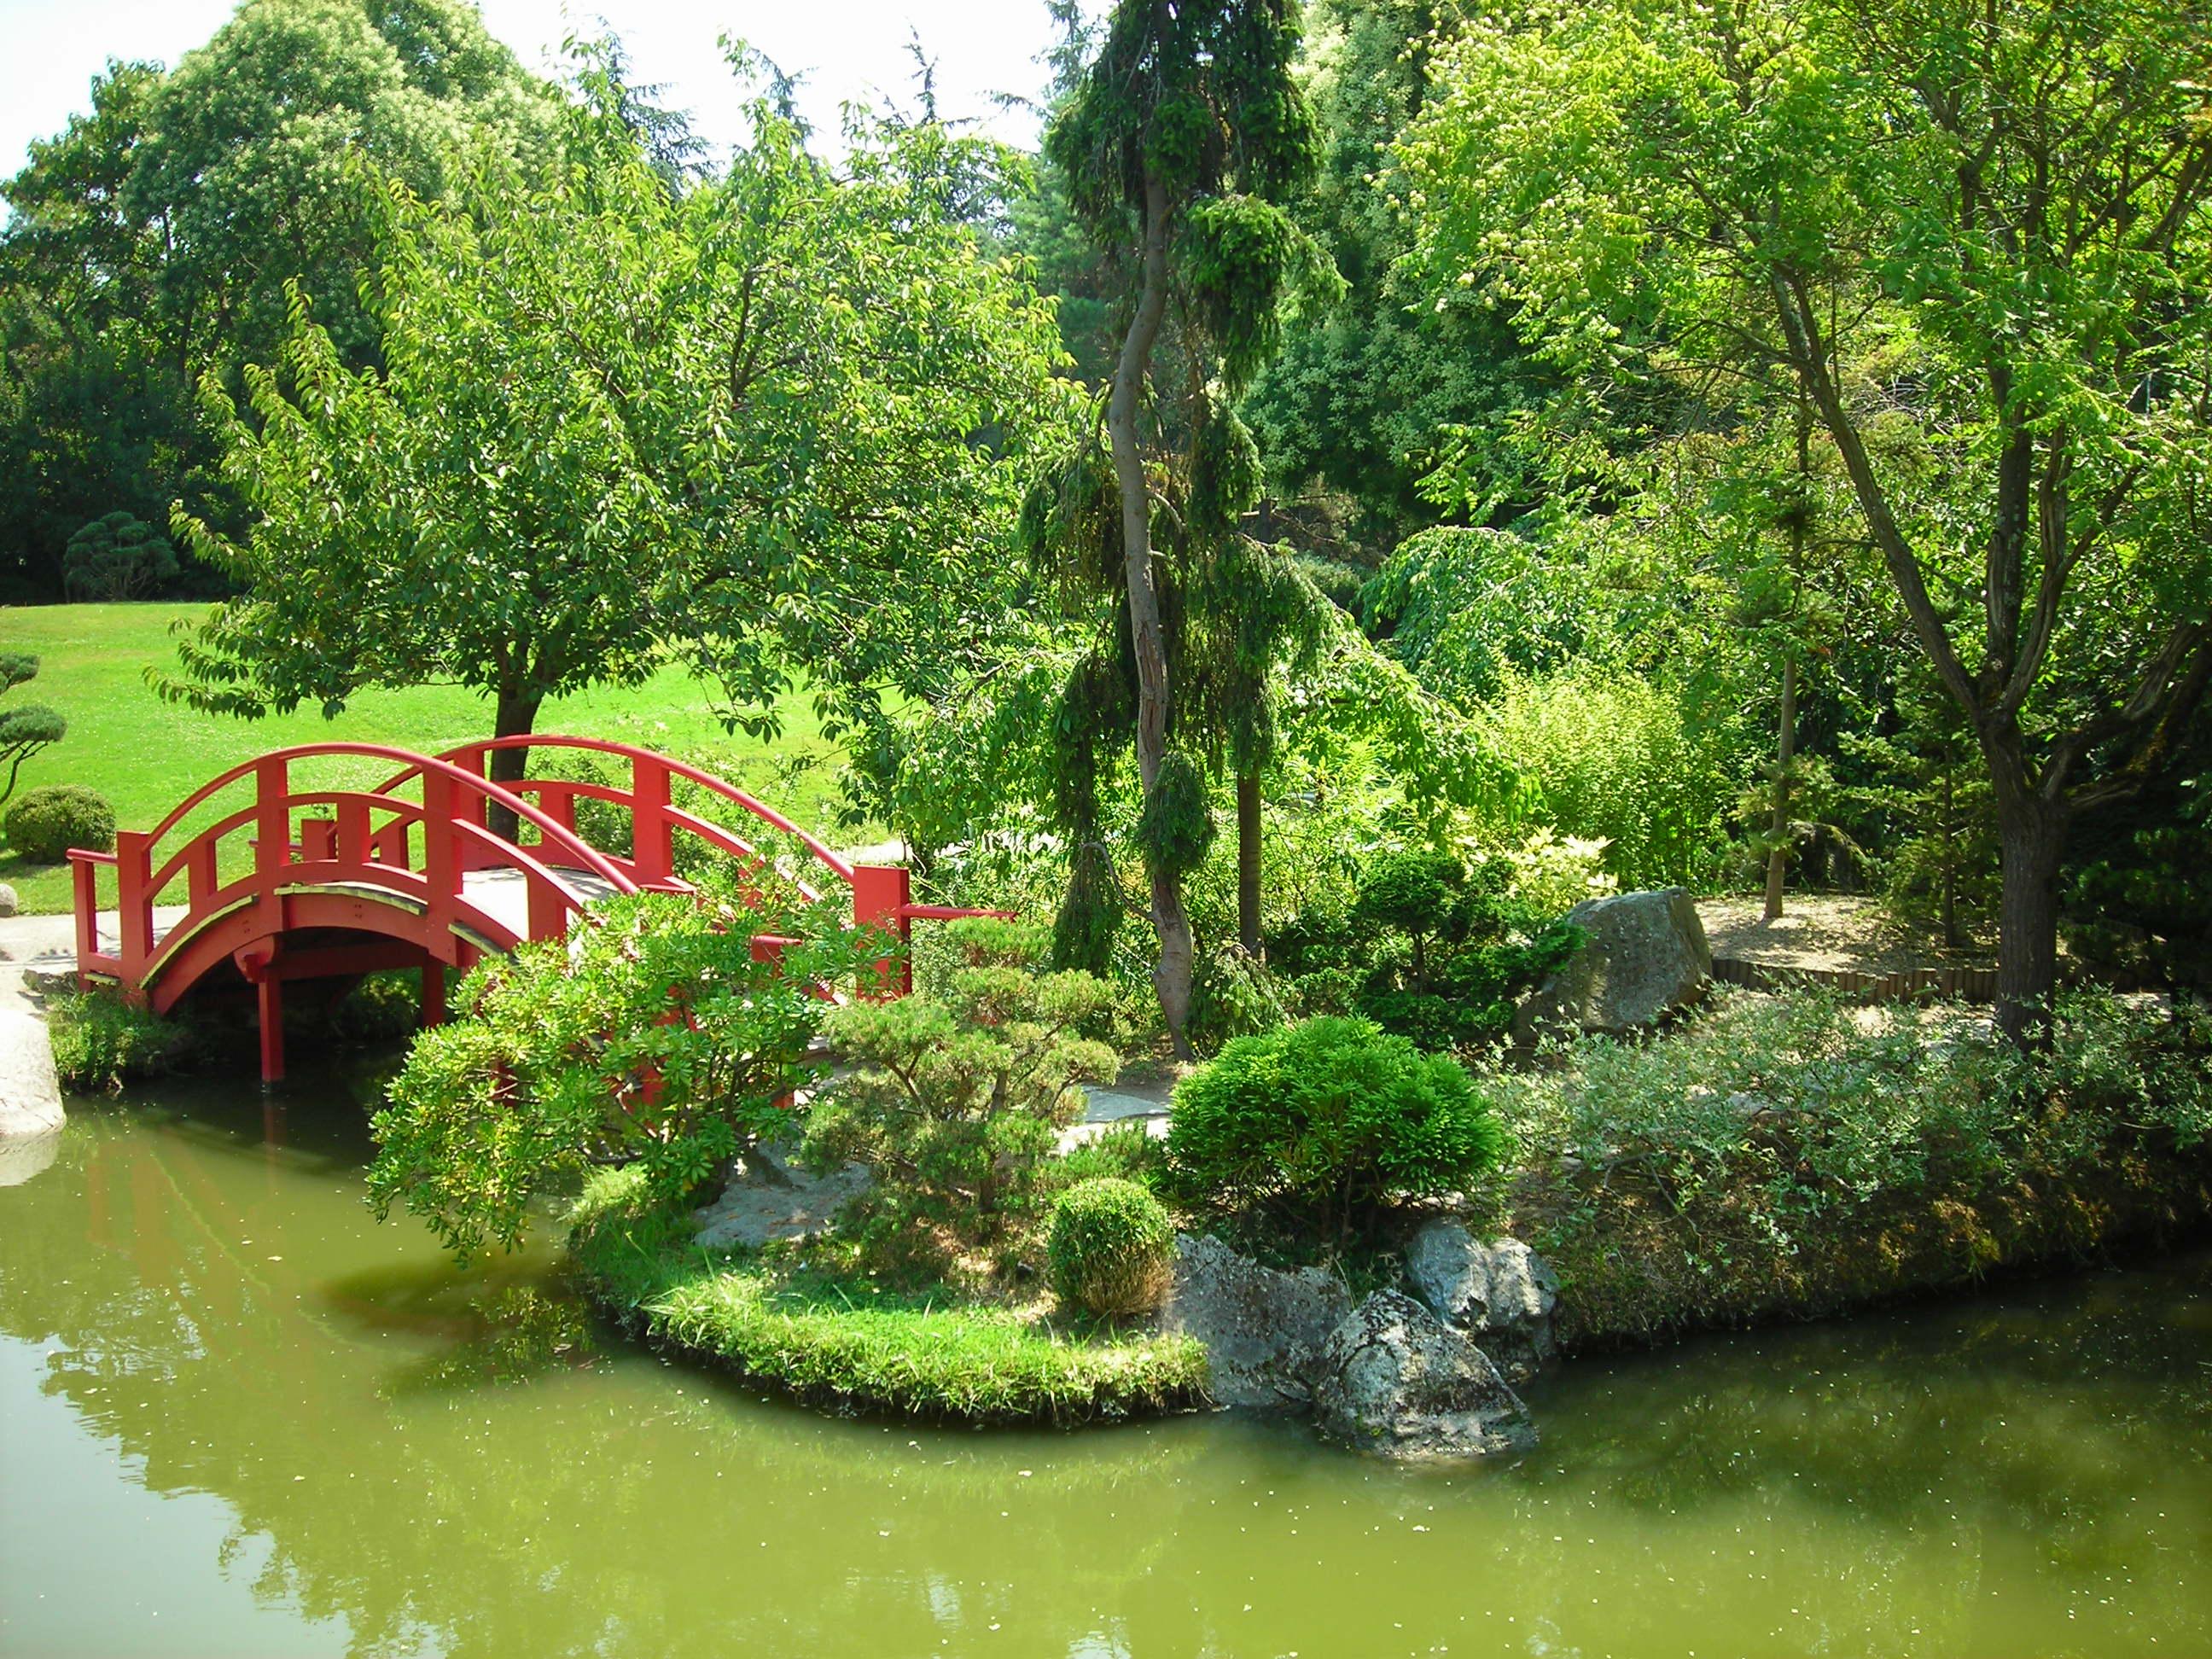 jardin japonais kaiyushiki by misaart on deviantart. Black Bedroom Furniture Sets. Home Design Ideas